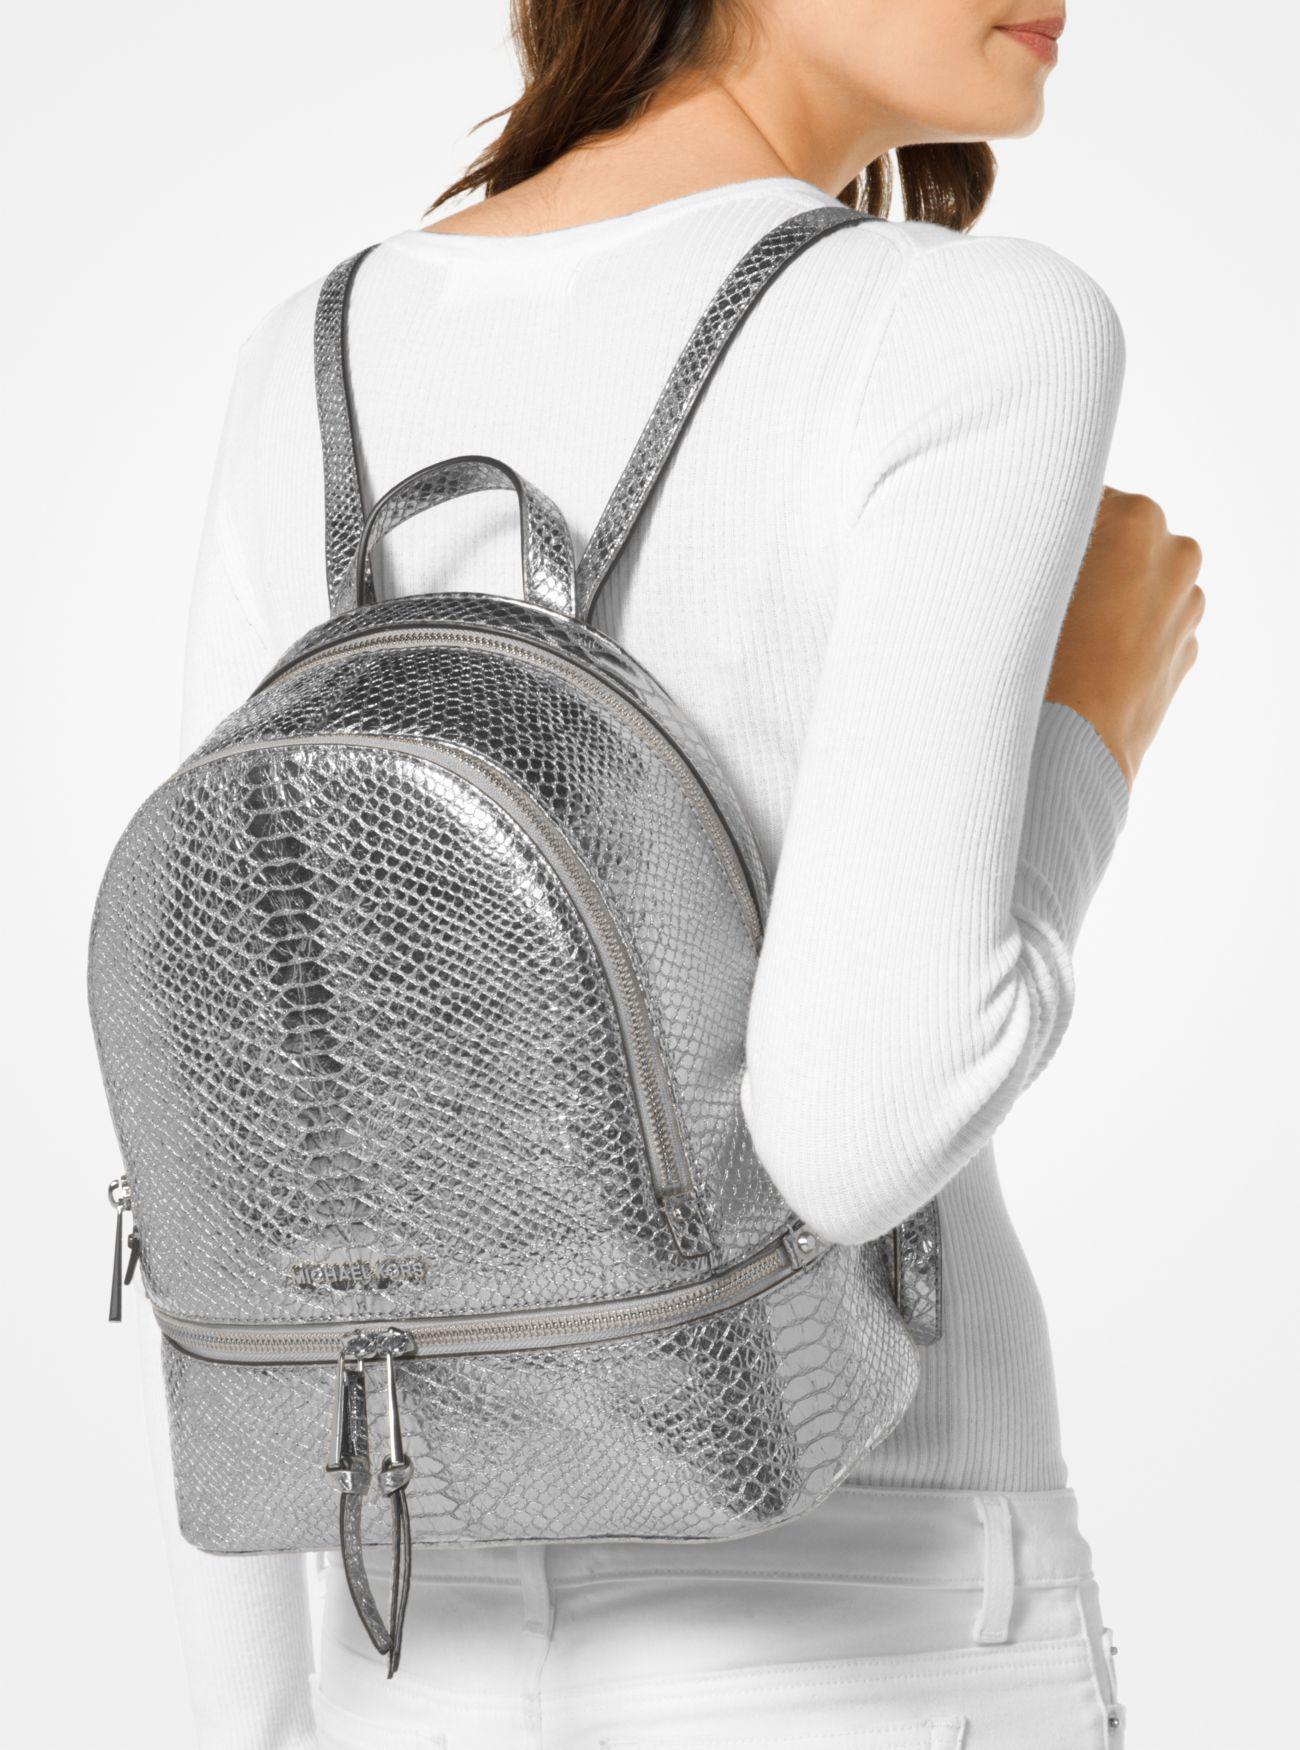 d2b6e562c0cb Michael Kors Rhea Medium Metallic Embossed-leather Backpack in ...